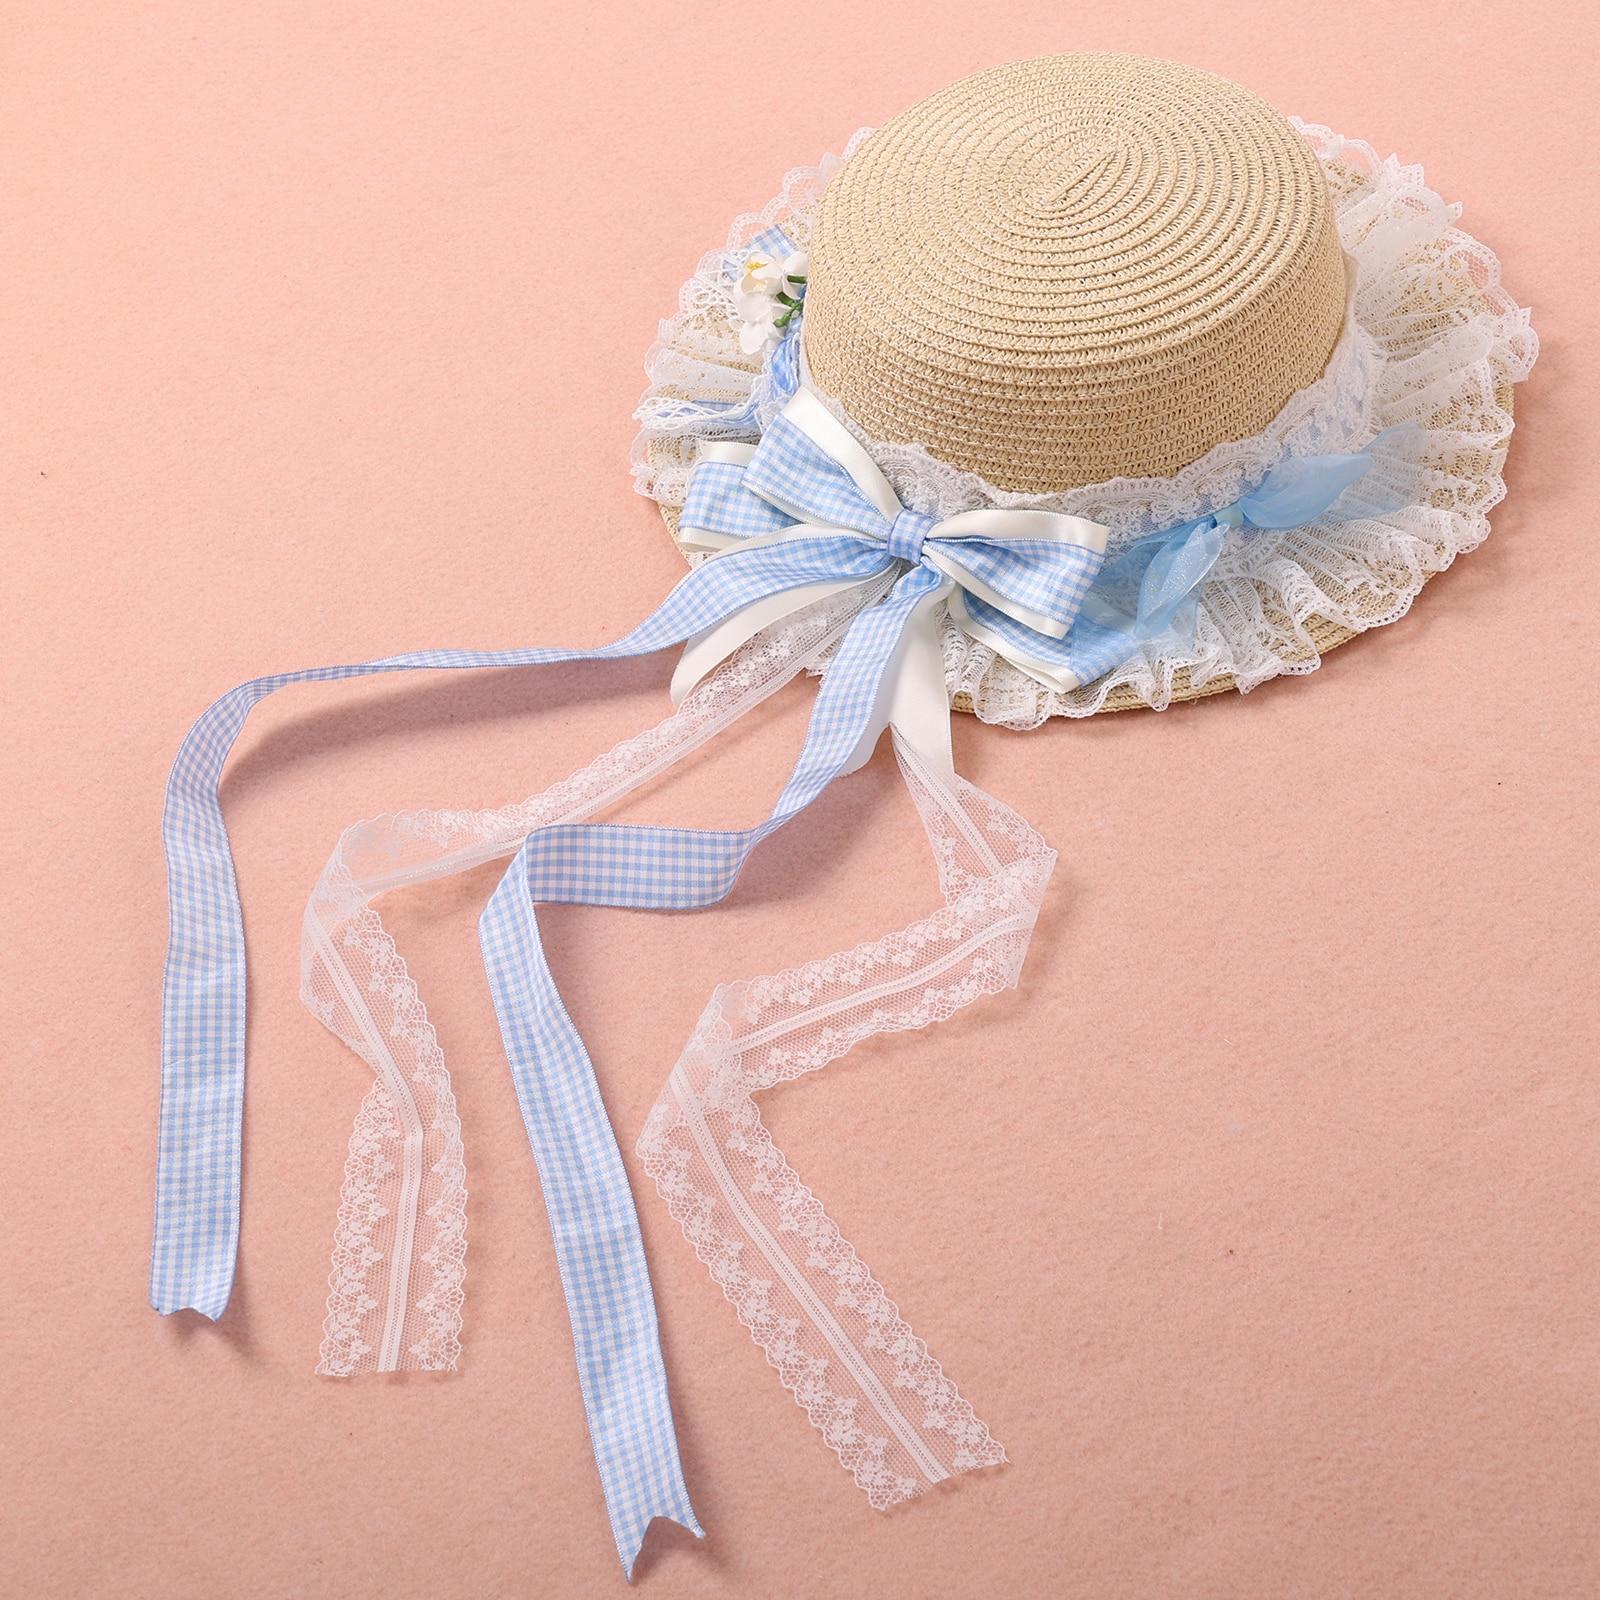 Lace Flower Elegant Beach Summer Garden Dome Straw Cute Lovely Lady Girl Hats